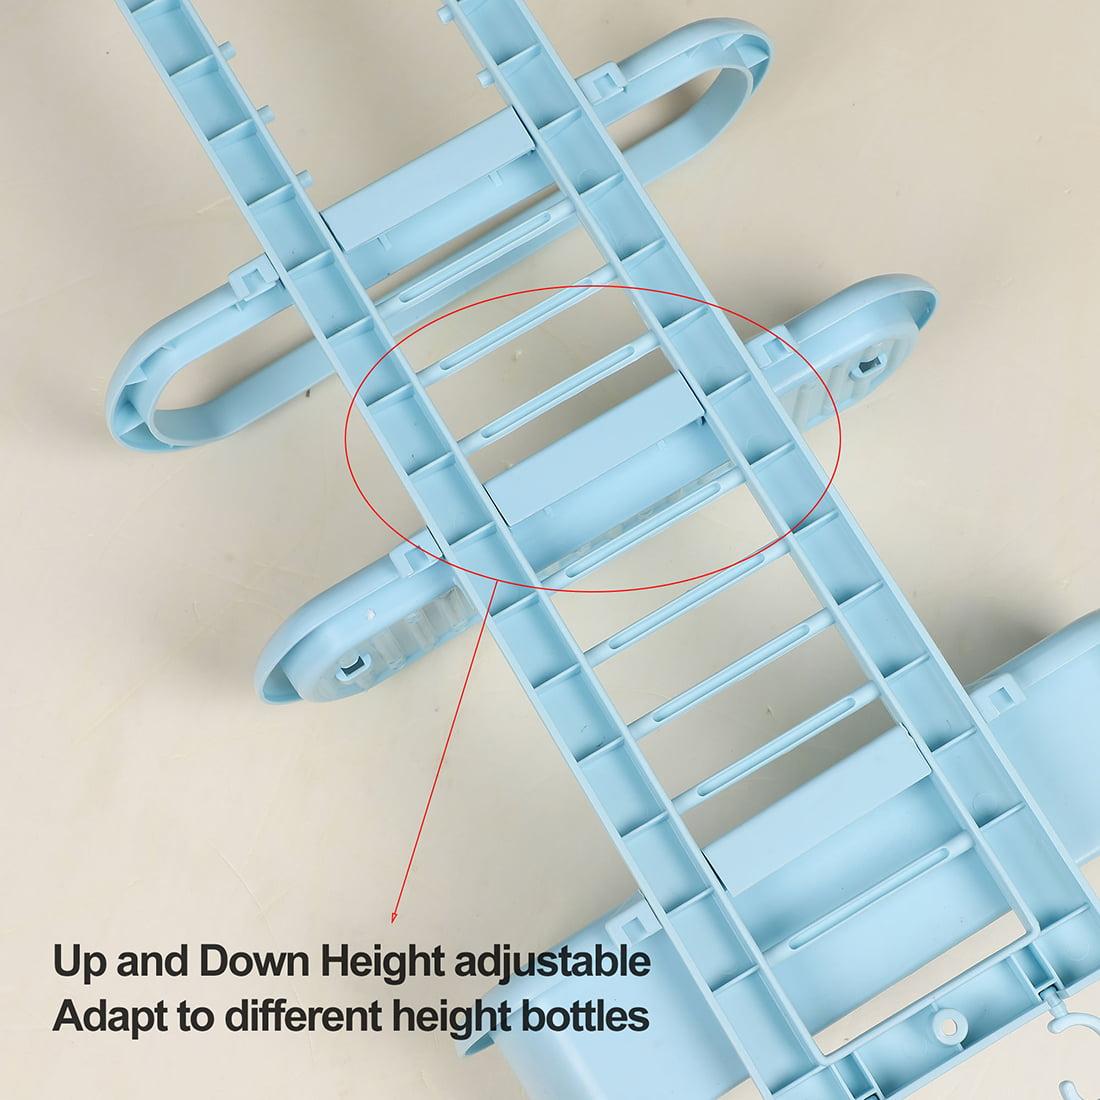 Plastic 3 Tier Hanging Bathroom Tub Shower Shelf Organizer for Bathroom Blue - image 1 of 9